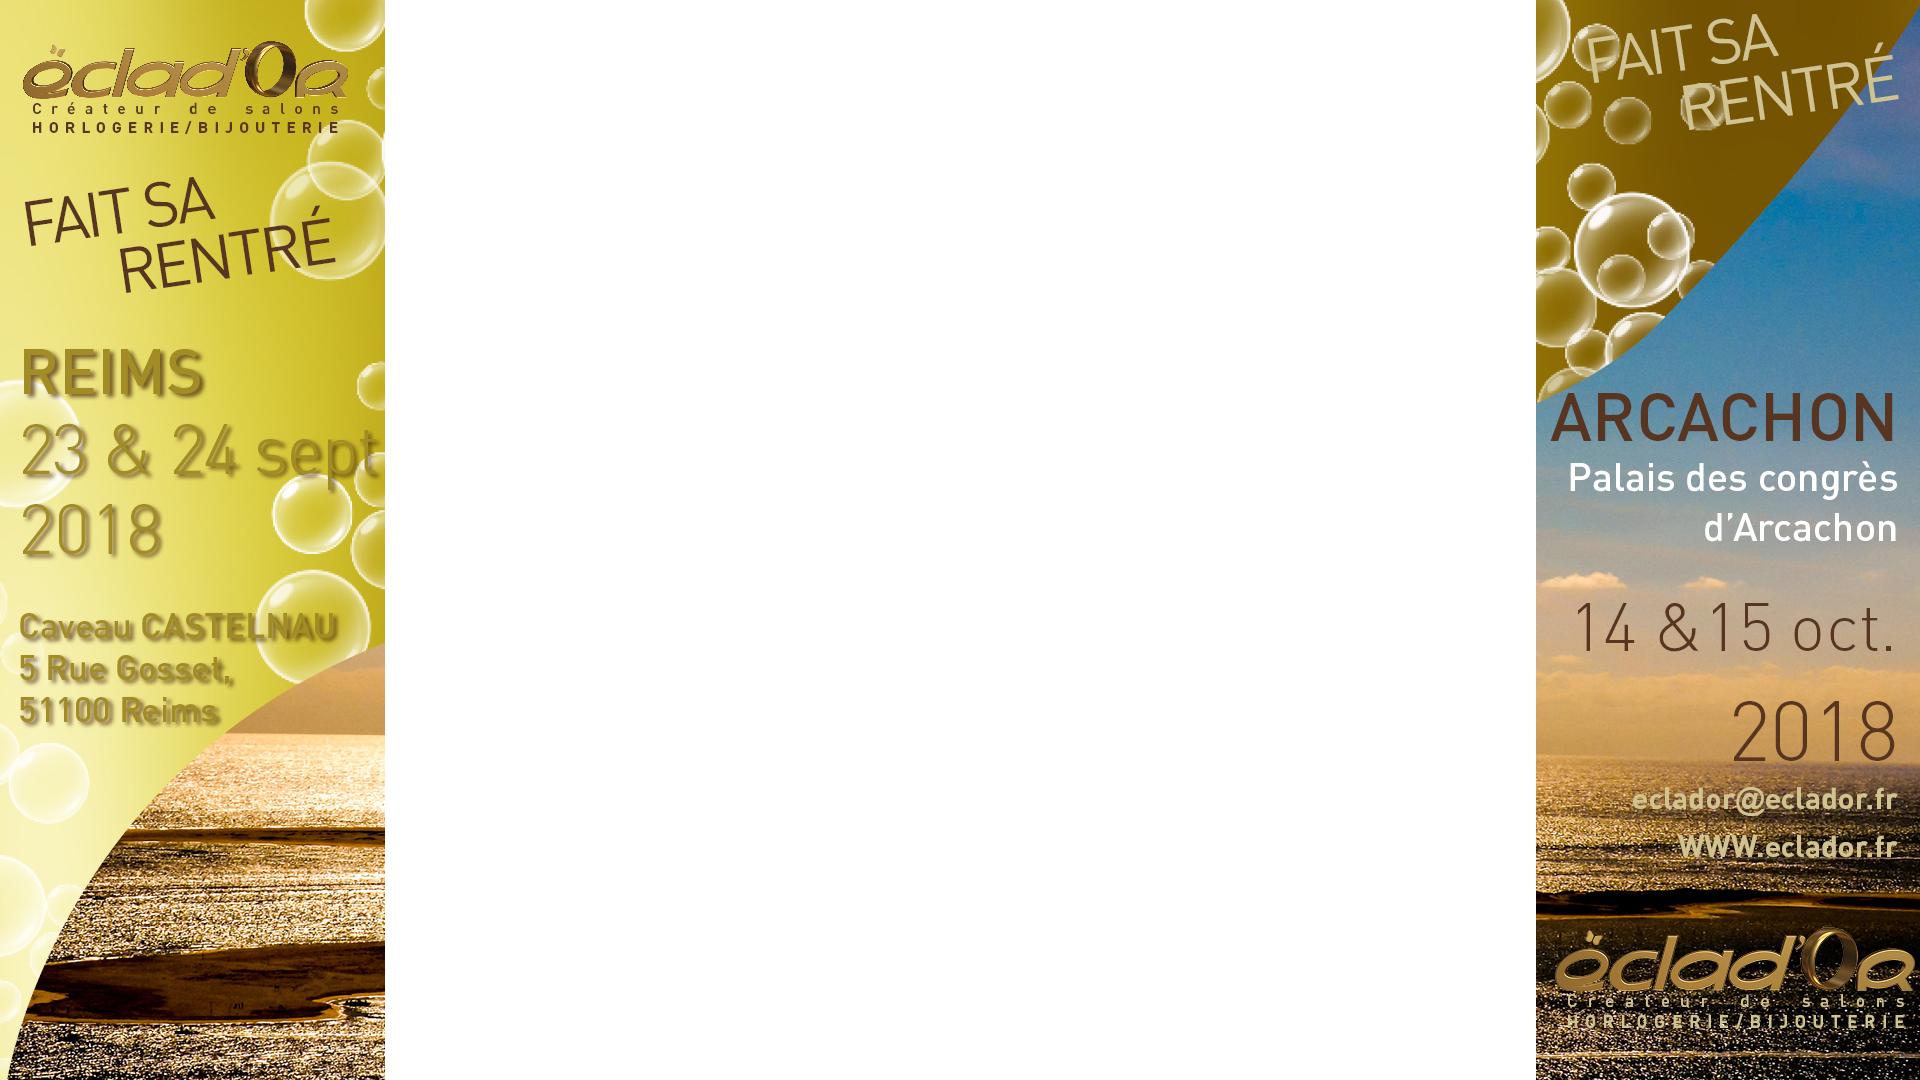 Bijouterie a vendre geneve